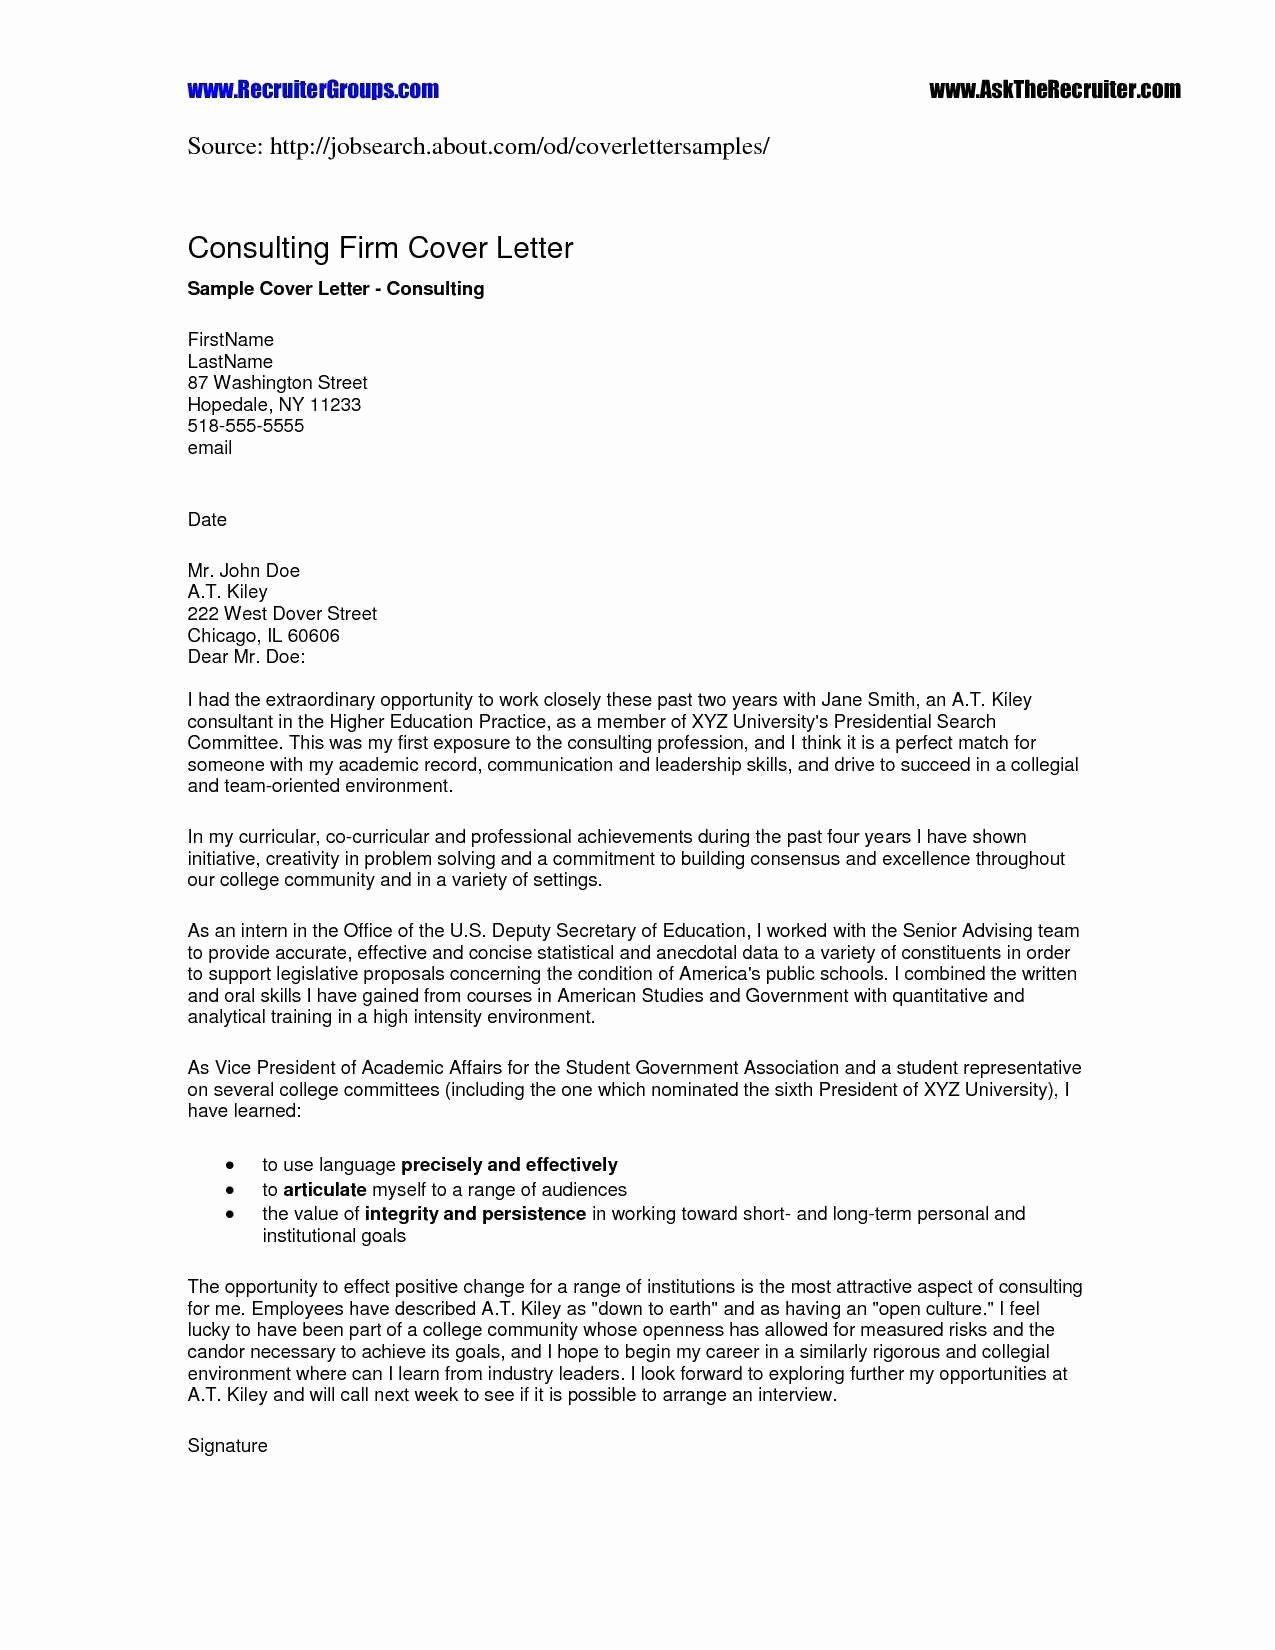 Sample Letter Of Collaboration Proposal Unique Business Collaboration Letter Template Samples